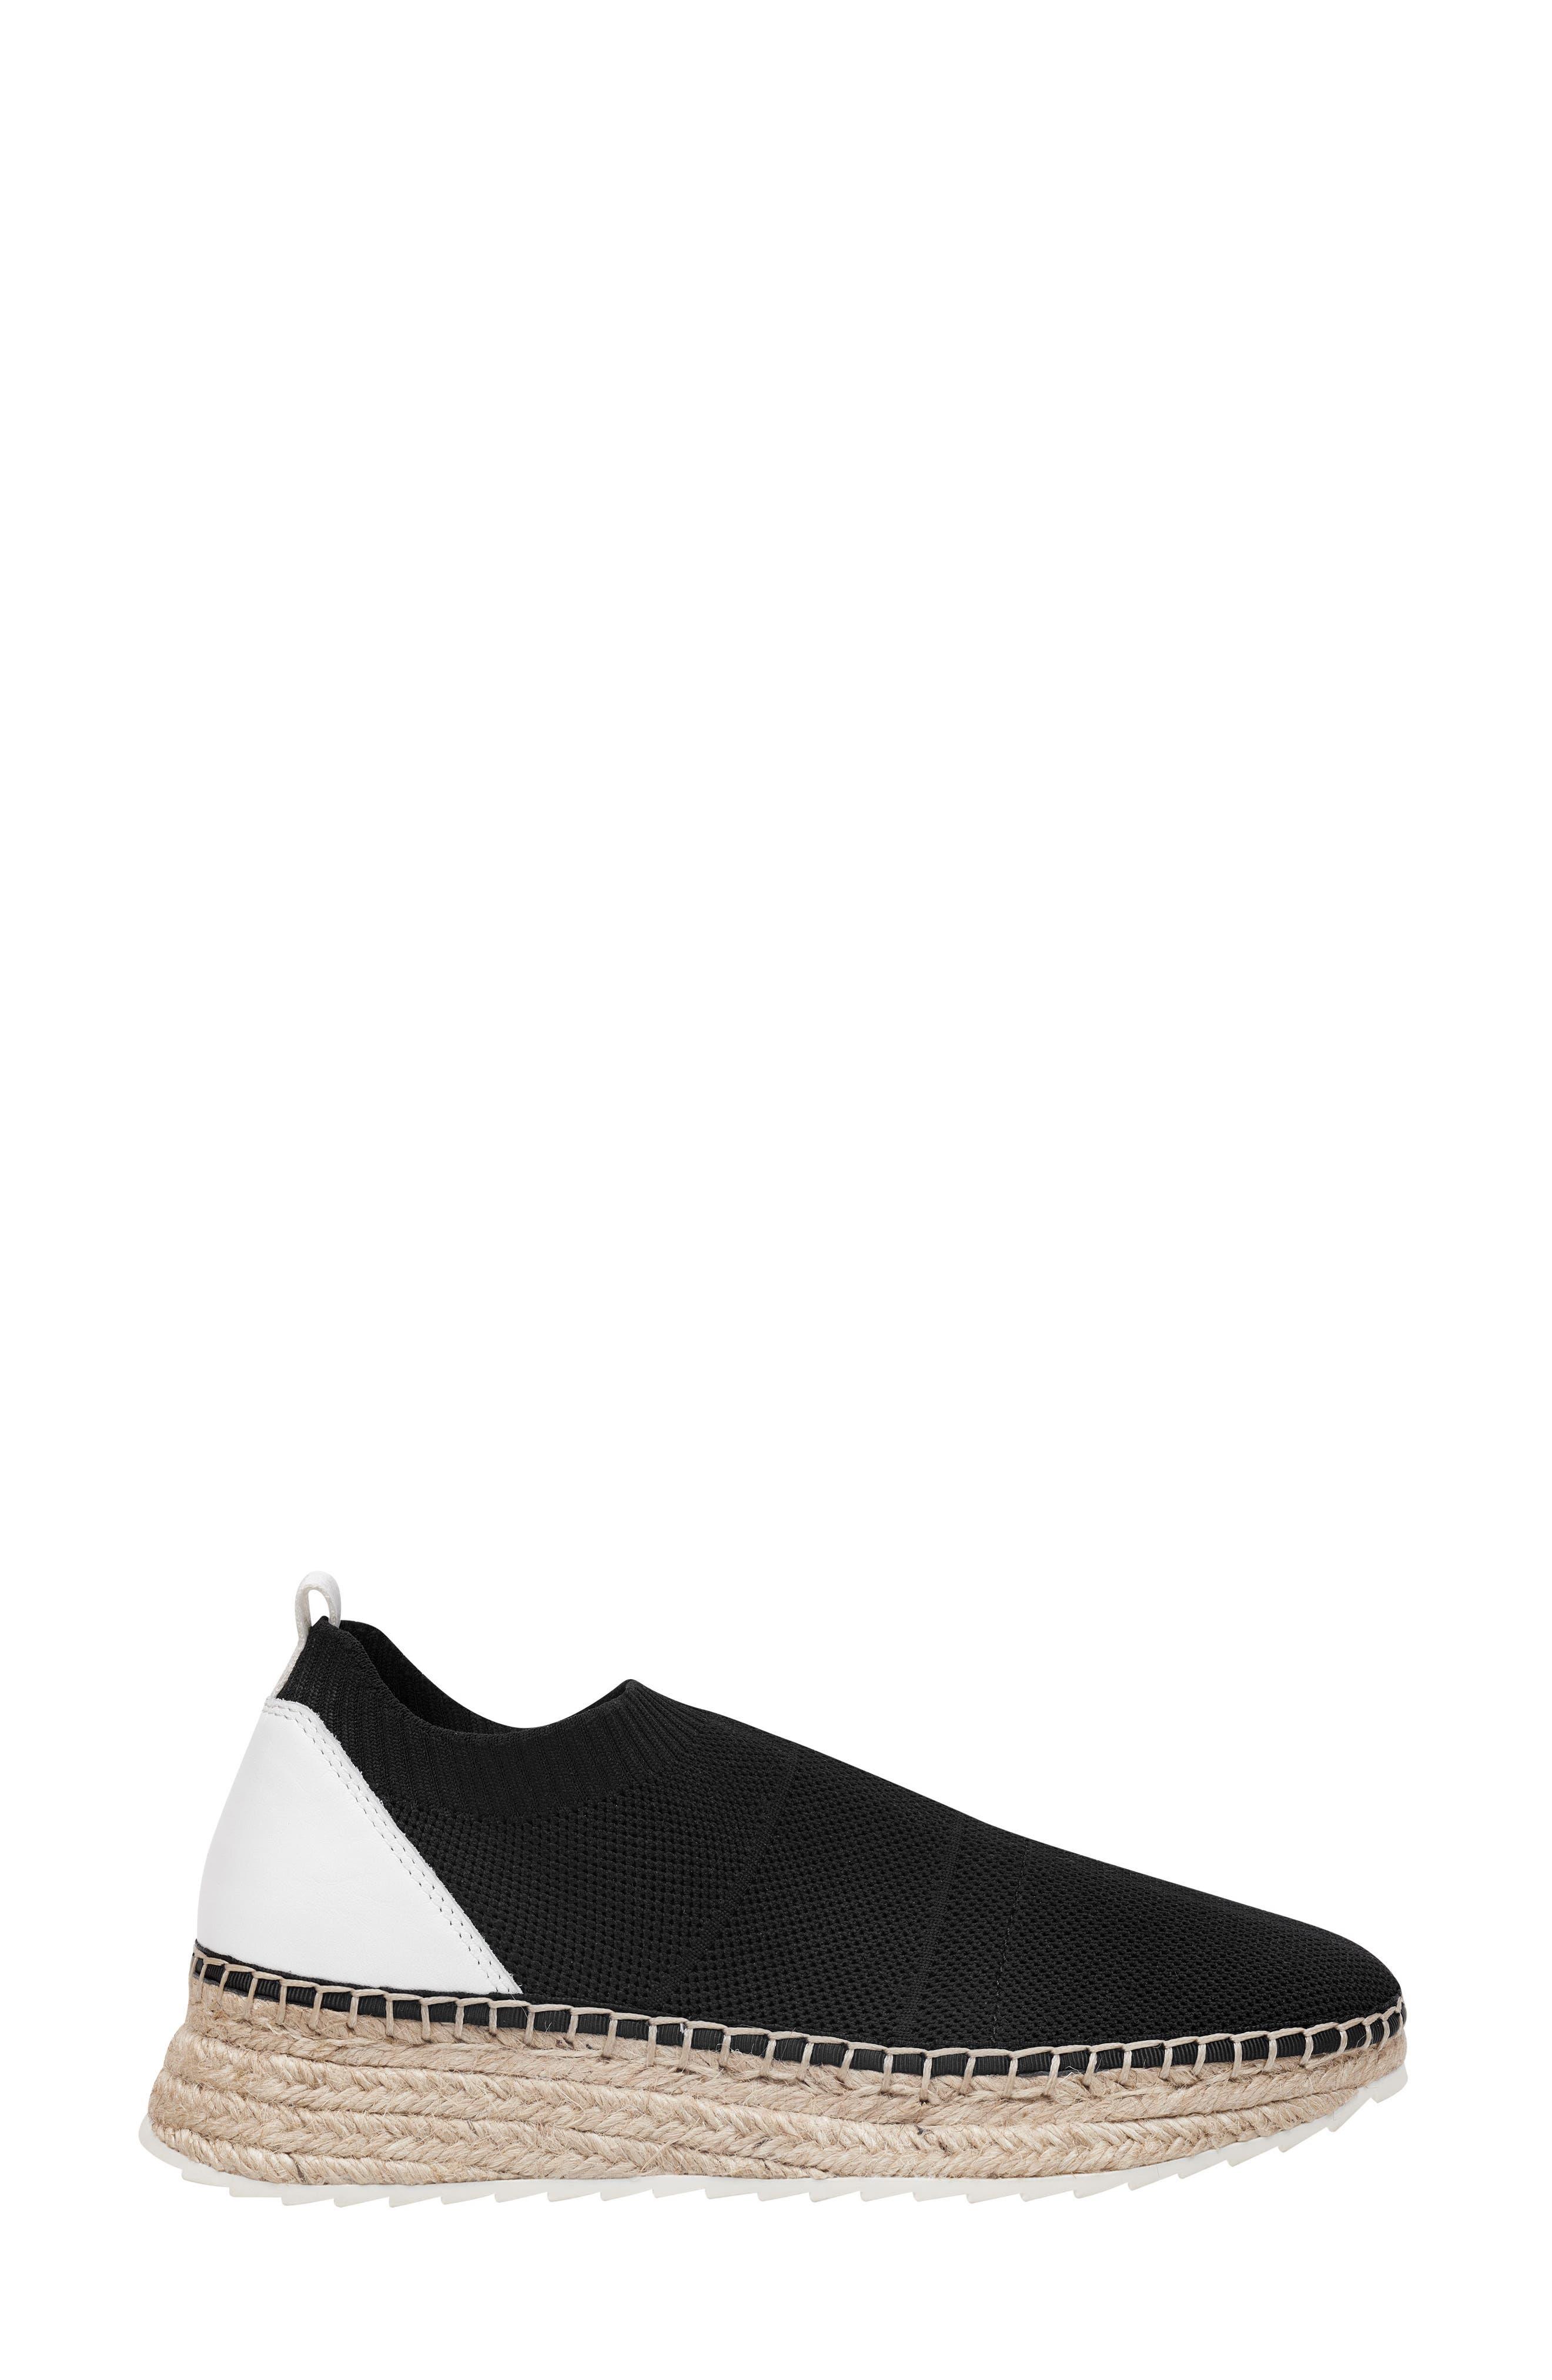 MARC FISHER LTD,                             Jilly Espadrille Sneaker,                             Alternate thumbnail 3, color,                             BLACK FABRIC